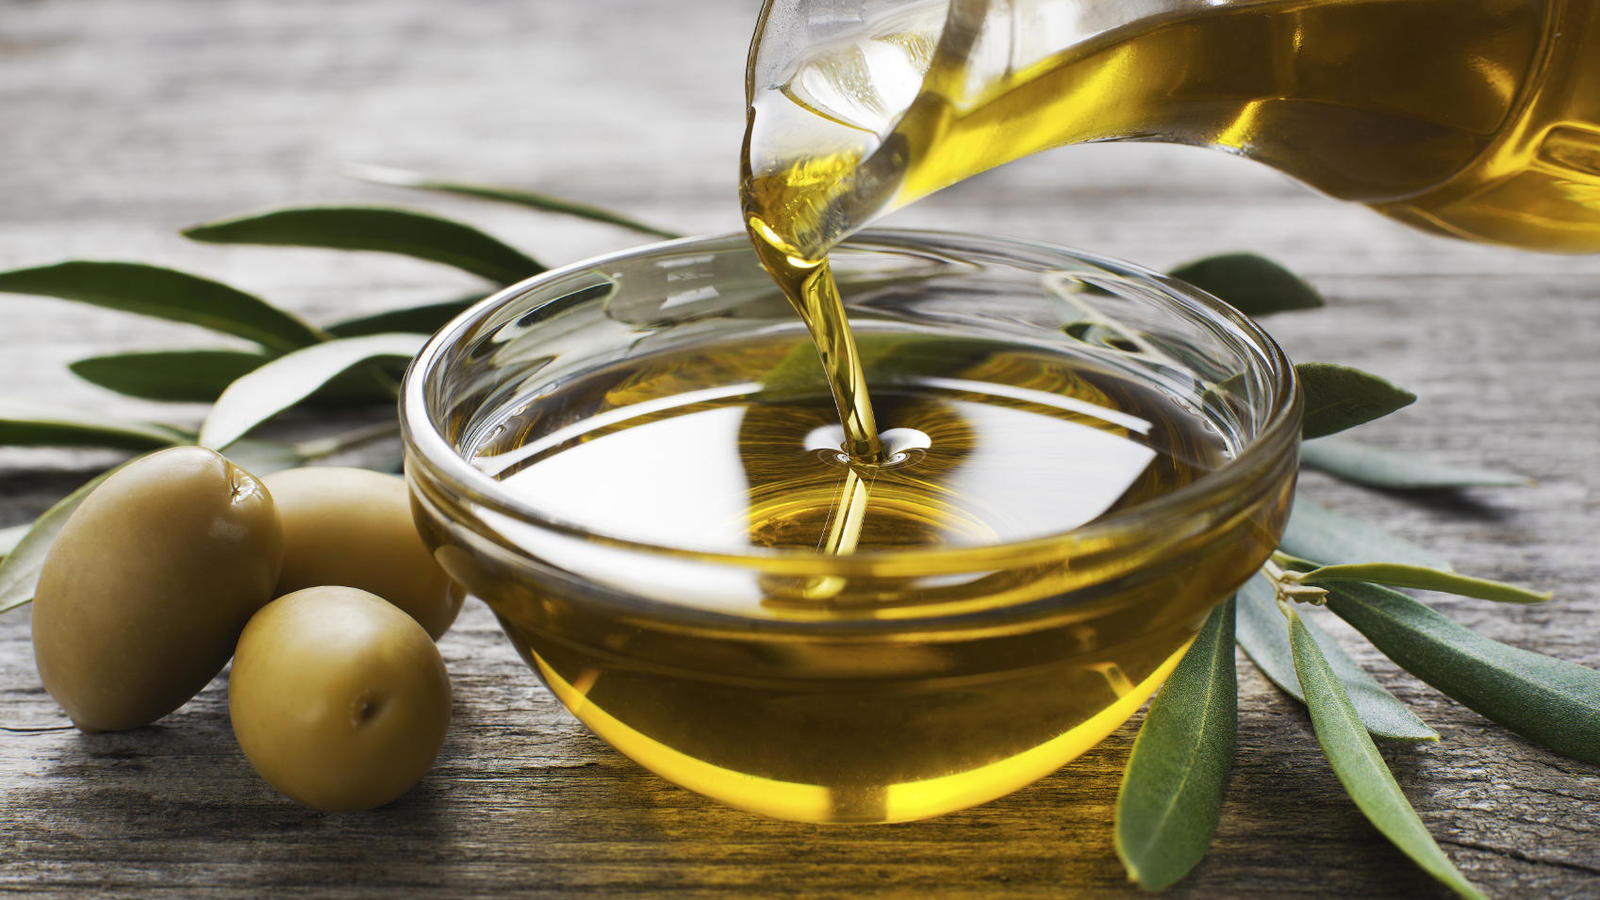 El aceite de oliva puede protegerte del alzhéimer